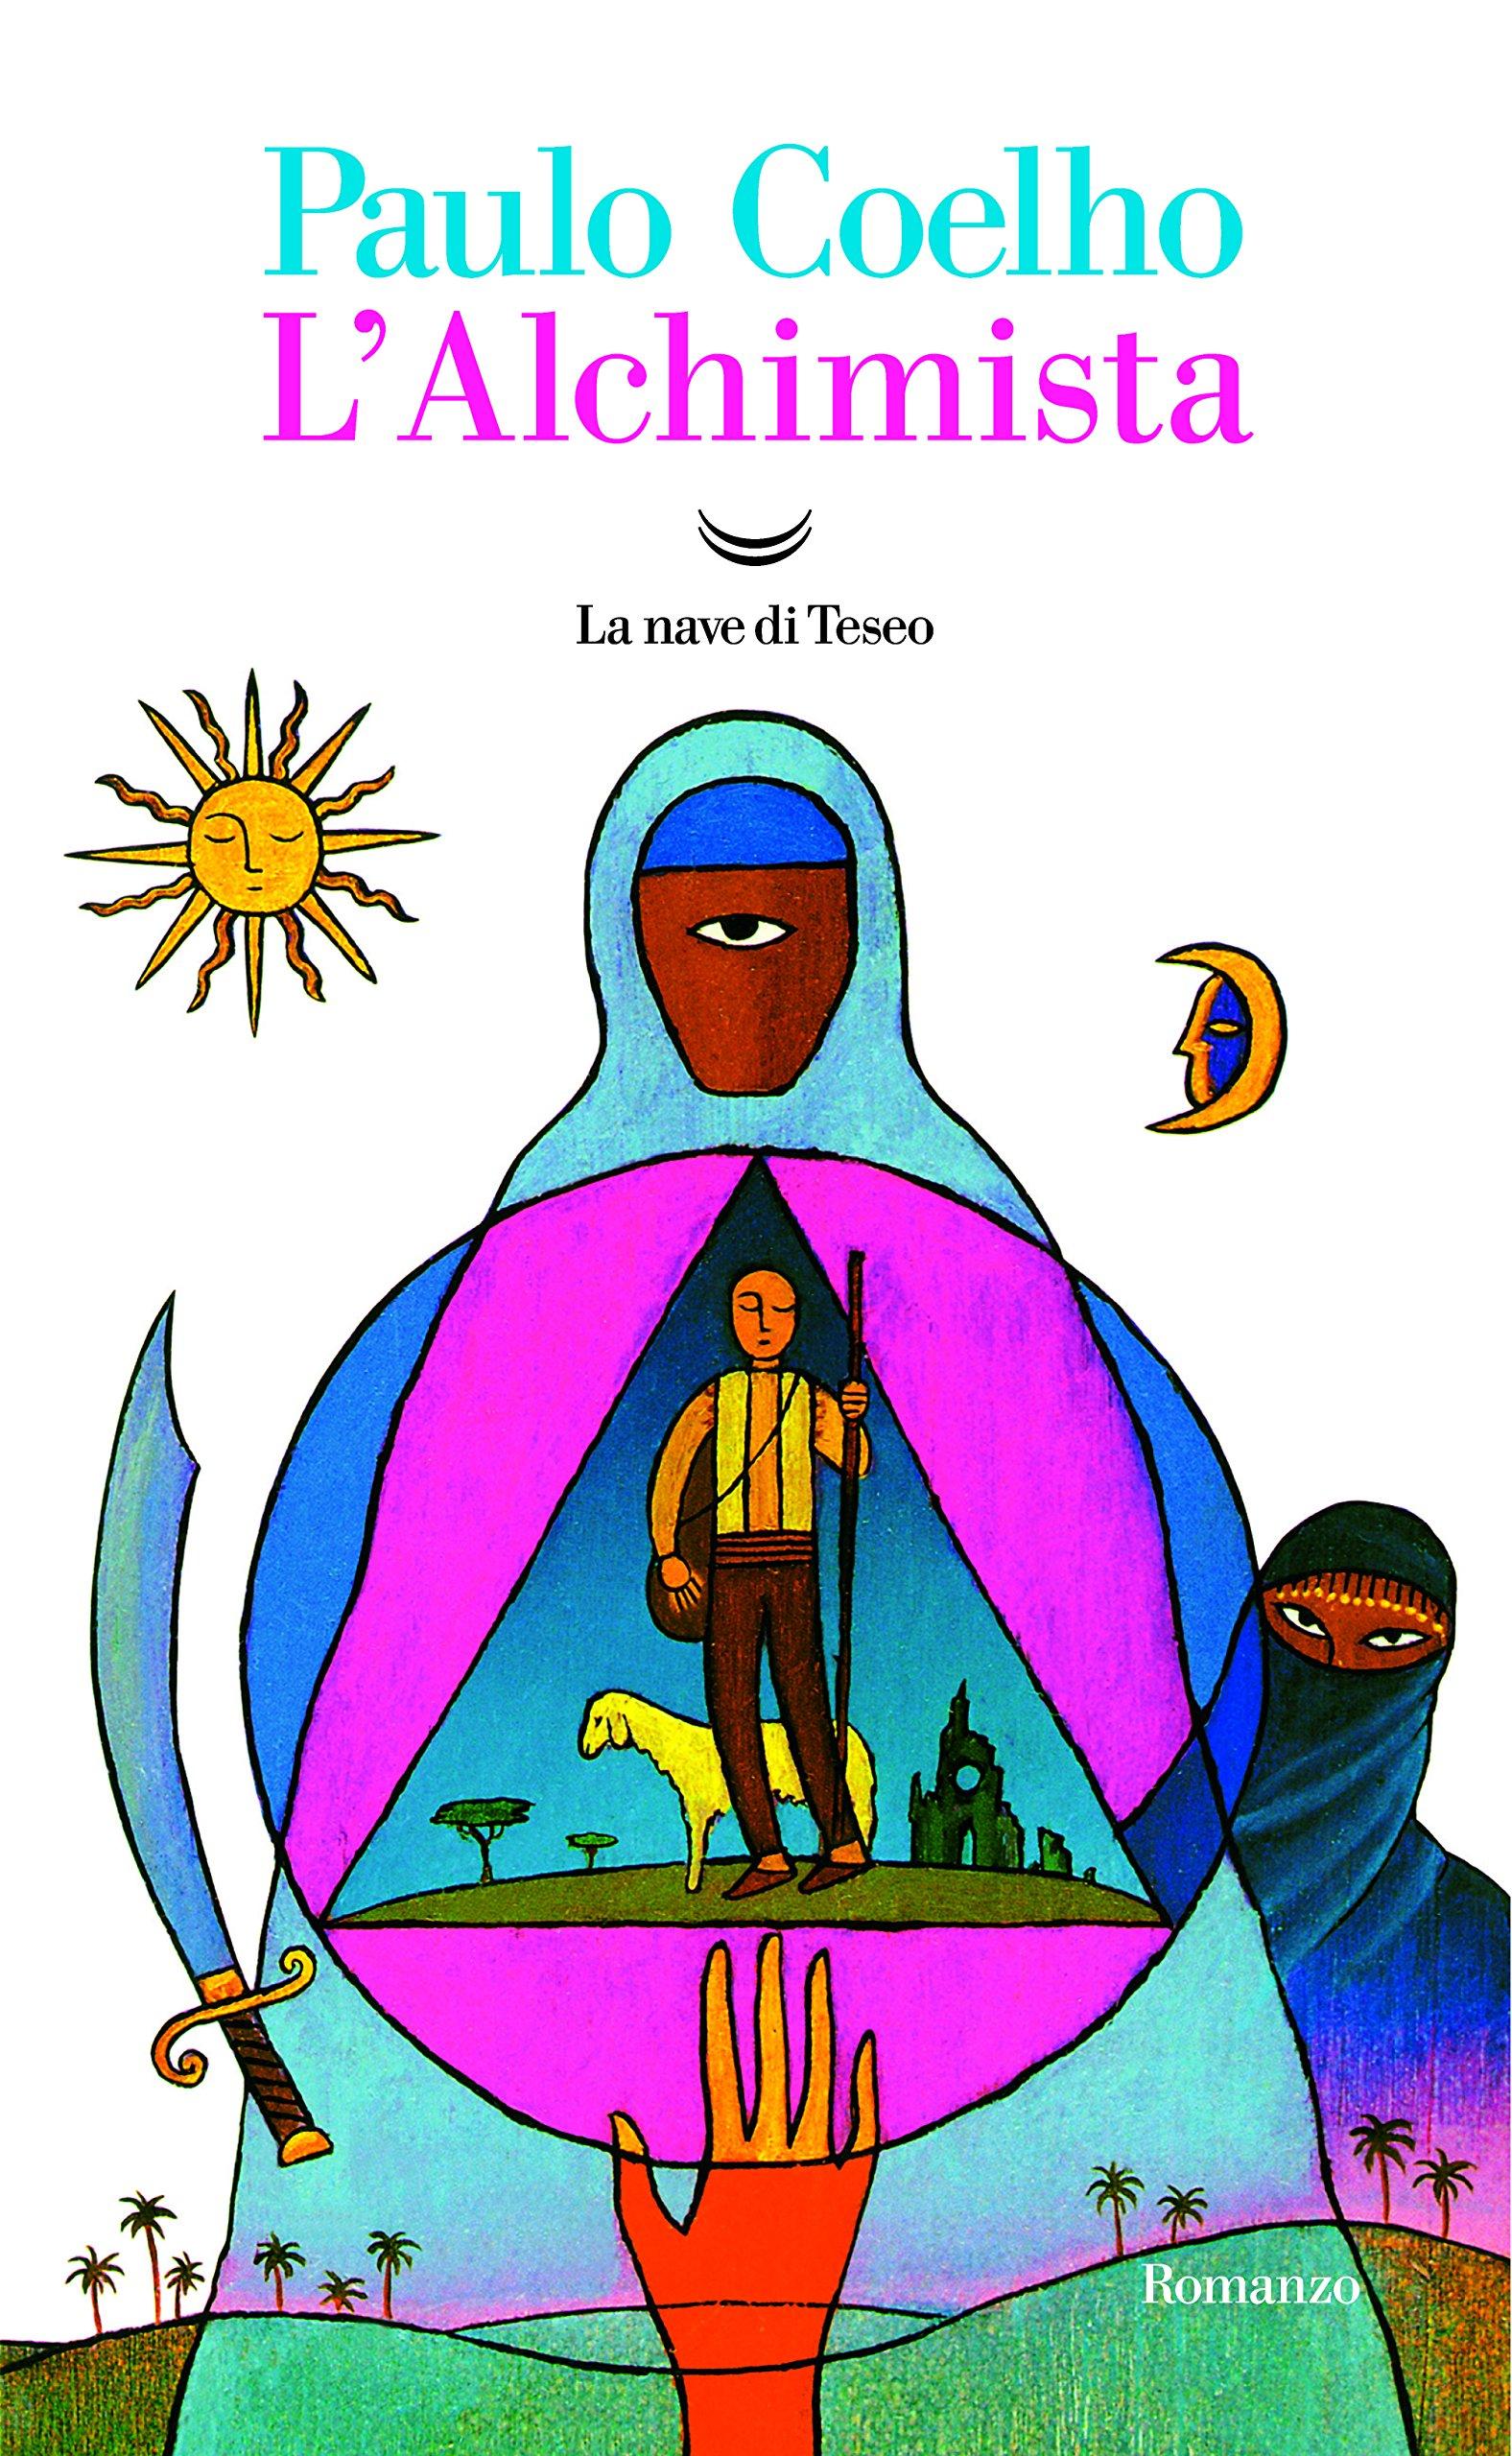 Amazon.it: L'alchimista - Coelho, Paulo, Desti, Rita - Libri